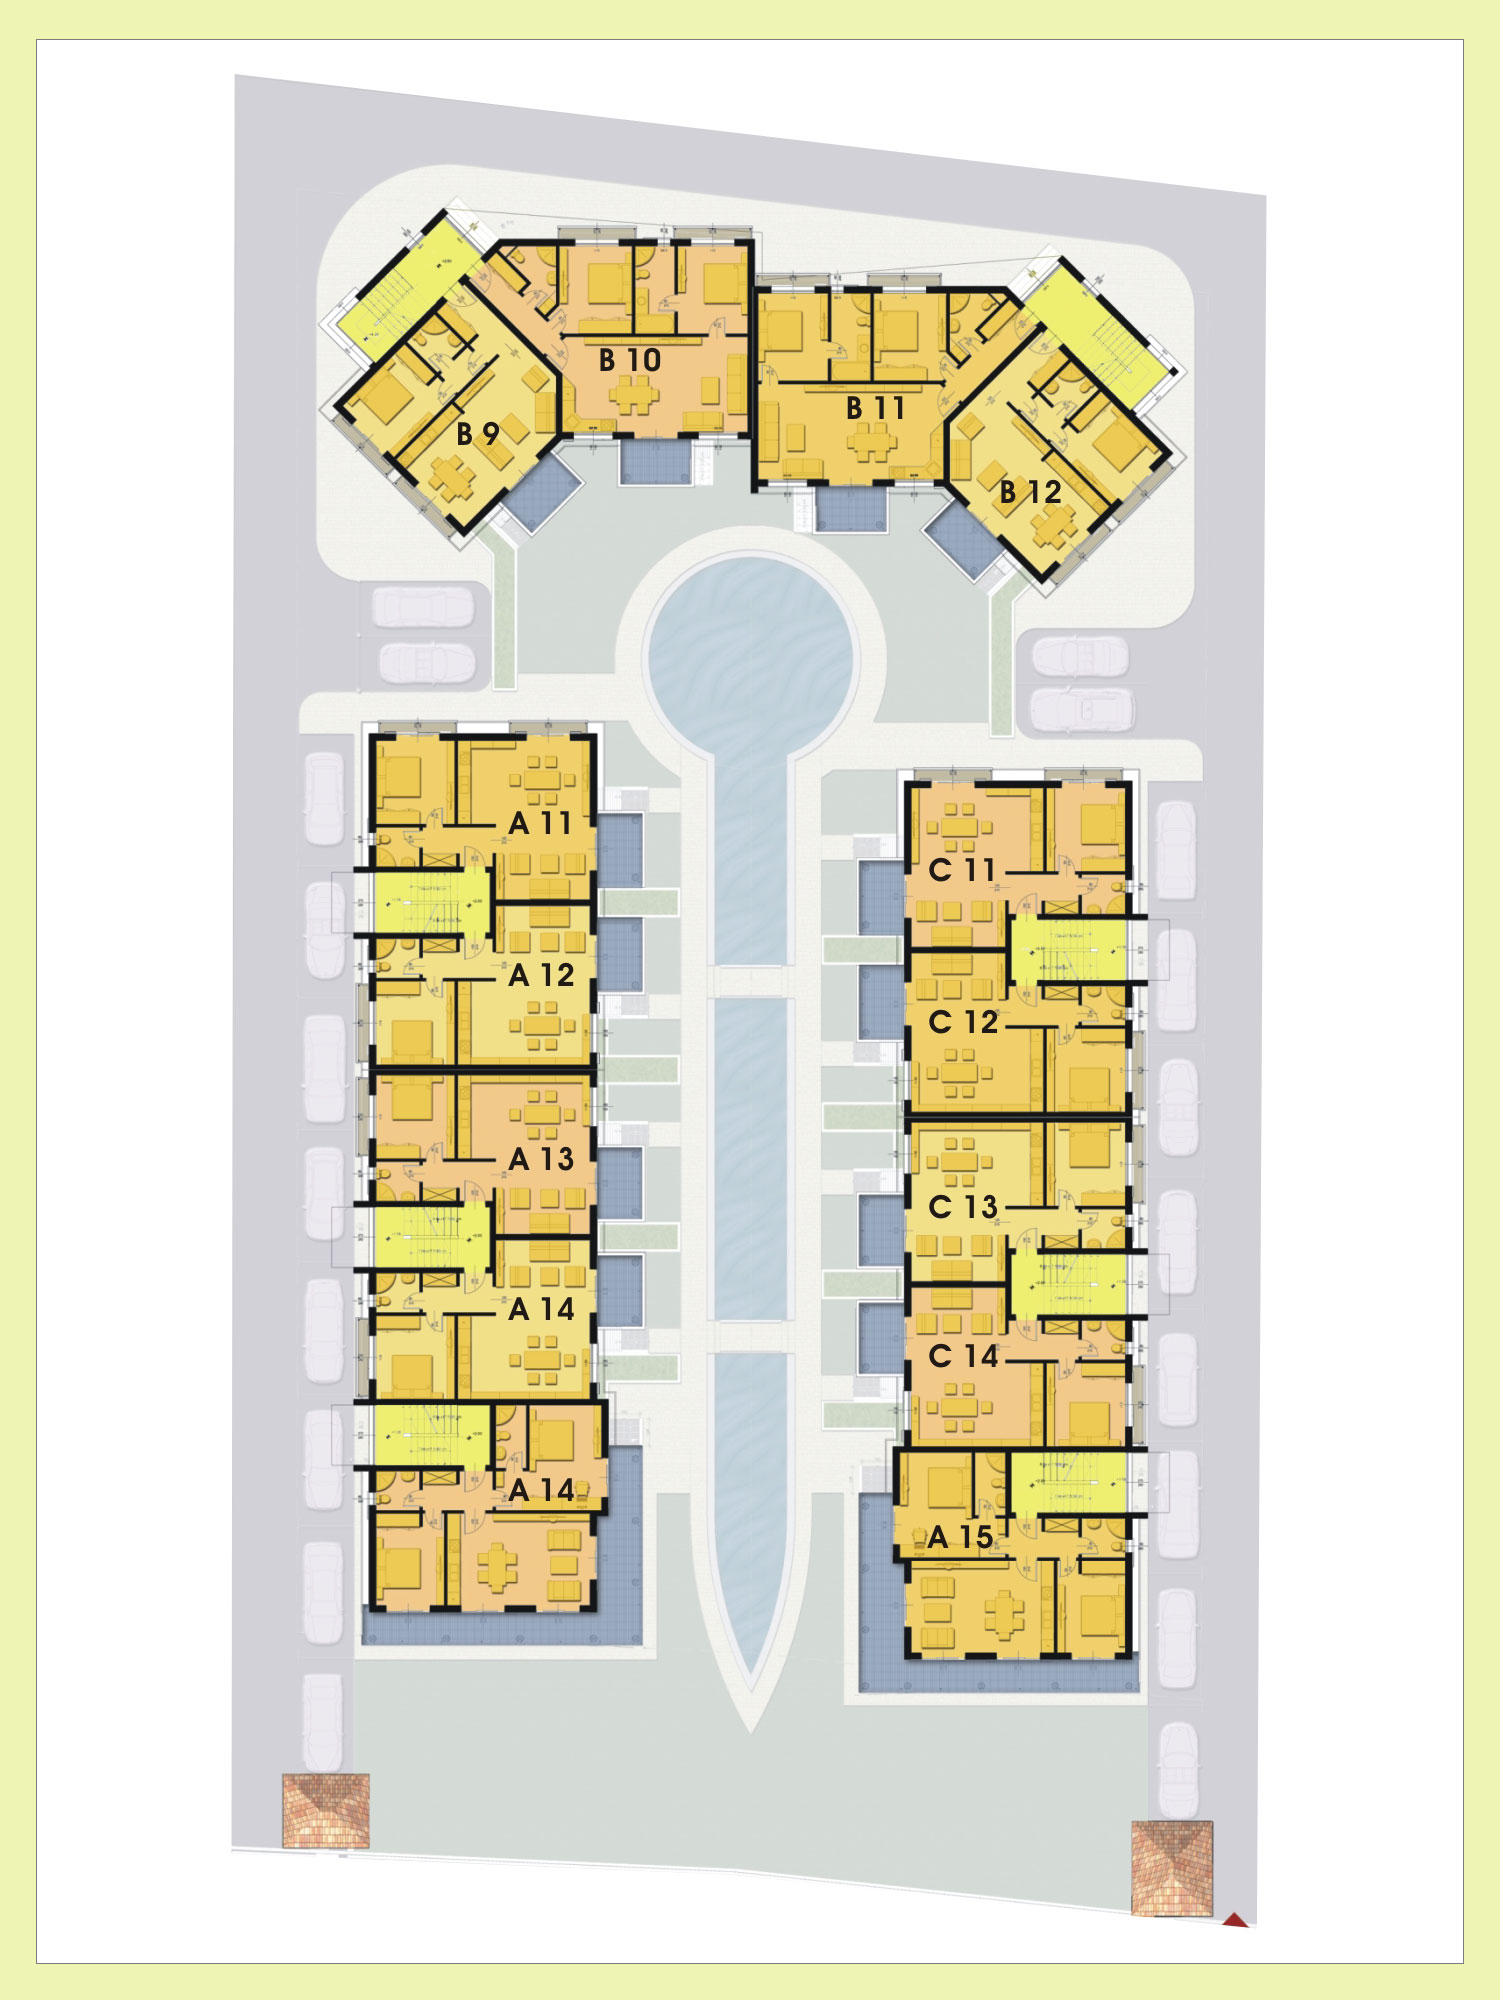 Paradise breeze residential complex for Apartment complex floor plans